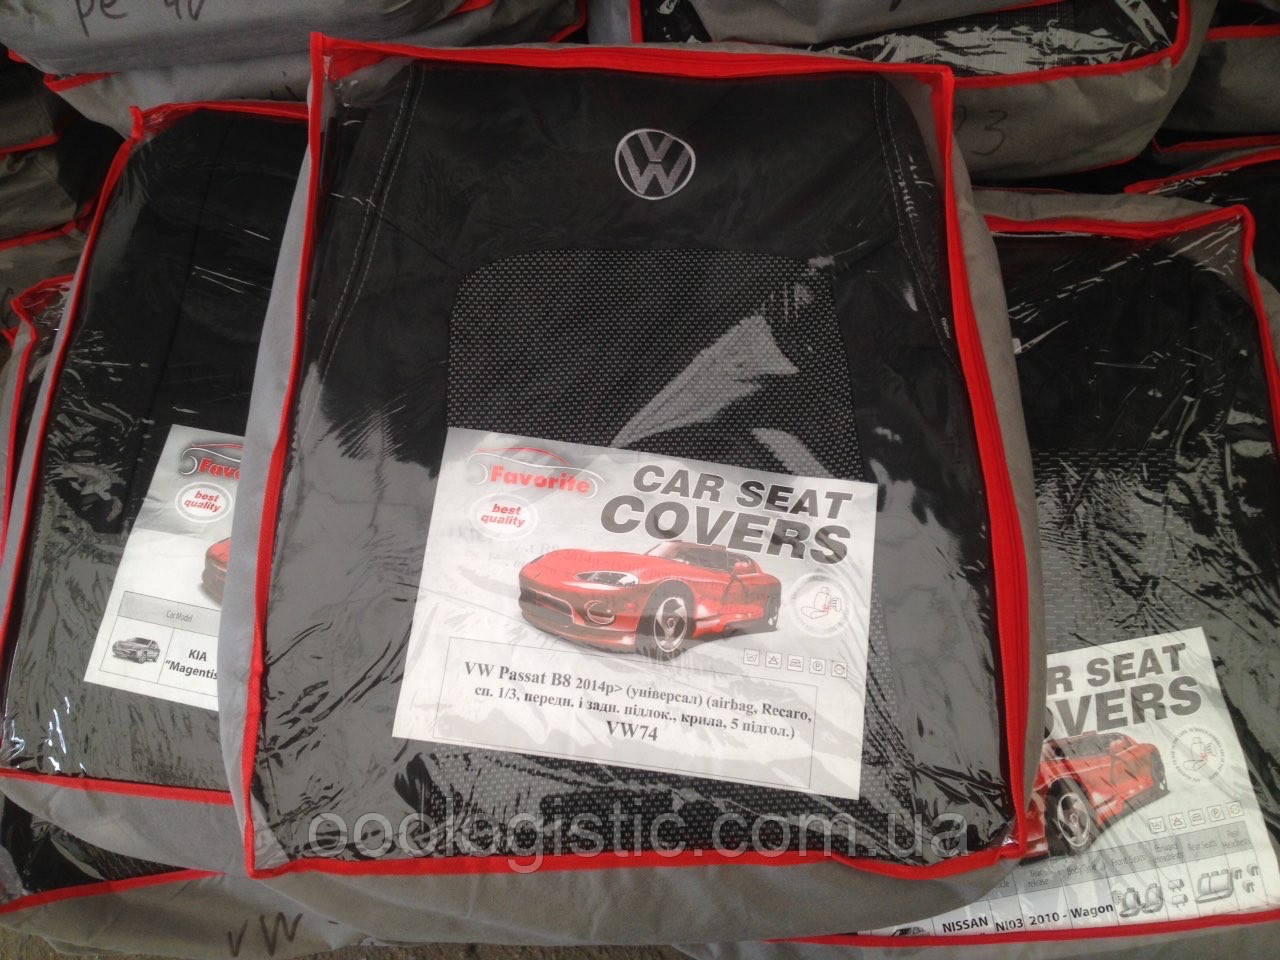 Авточохли Favorite на Volkswagen Passat B8 2014 - універсал